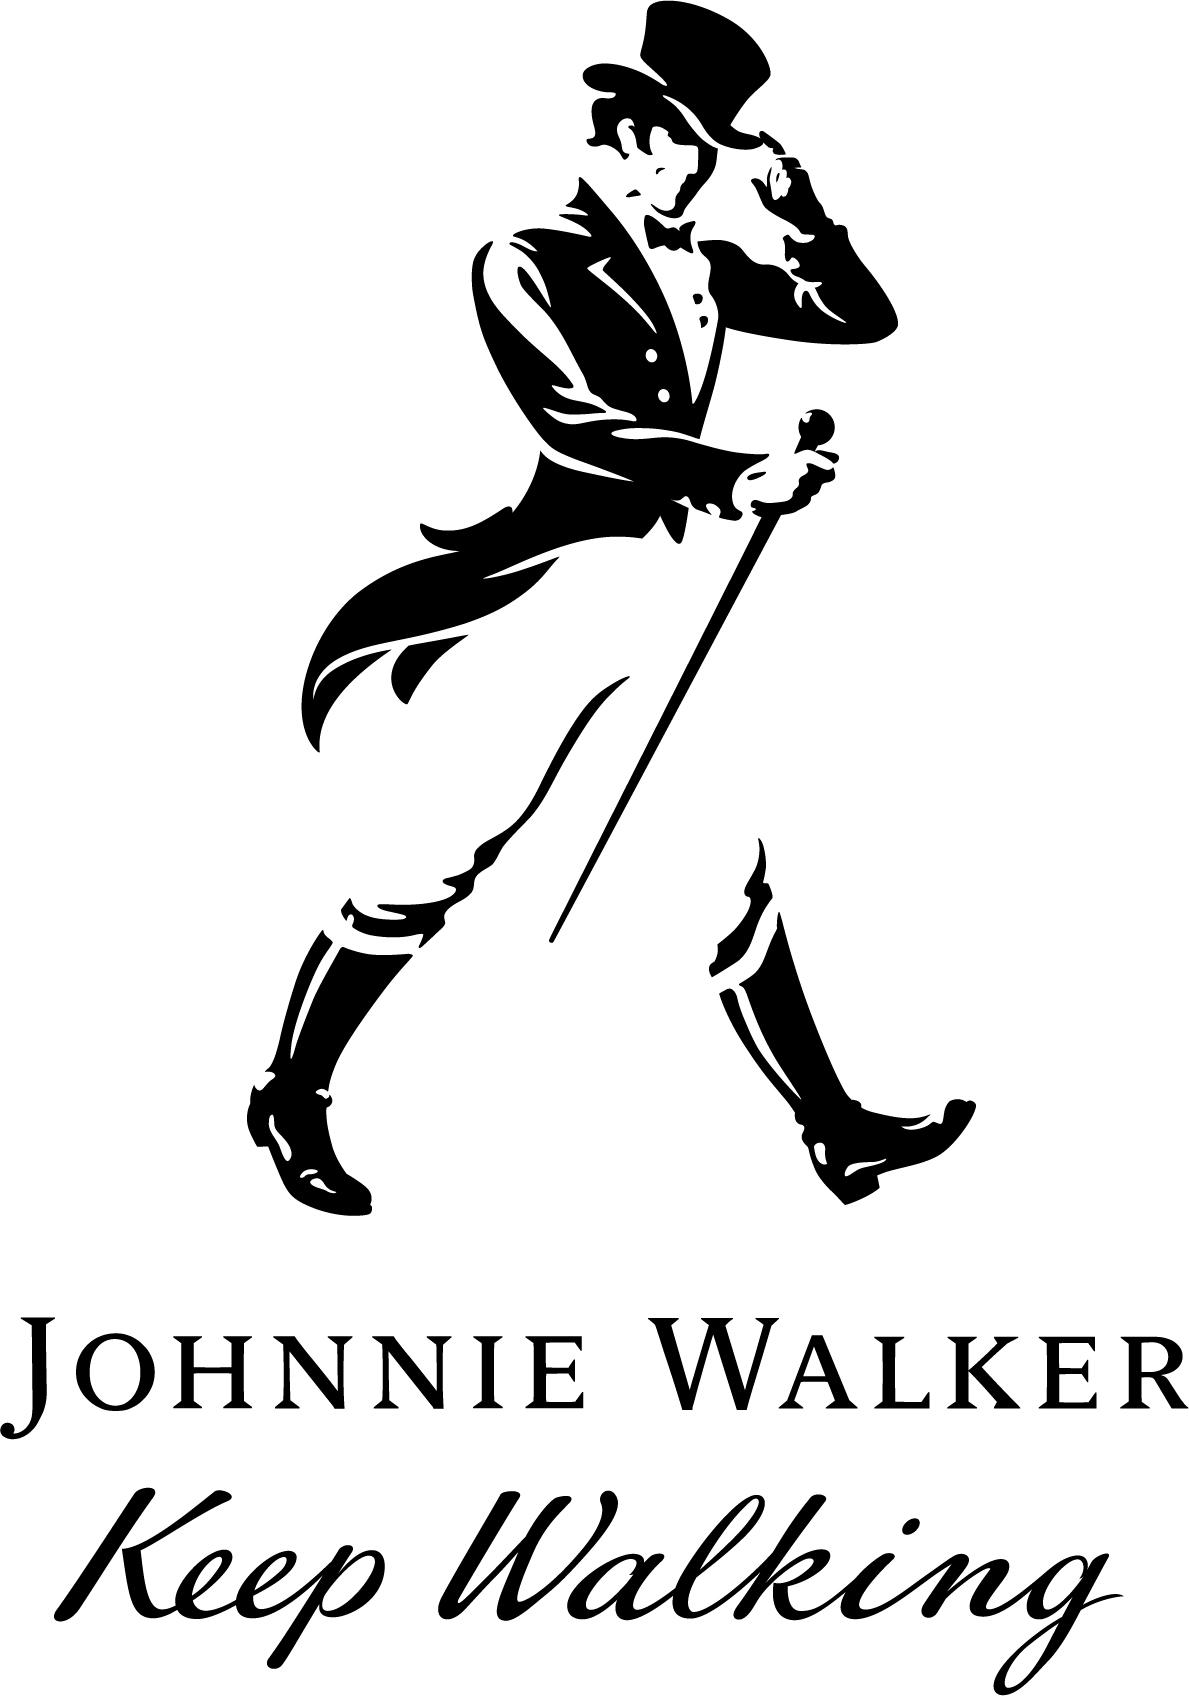 JW_Logo_KeepWalking_LockUp.jpg